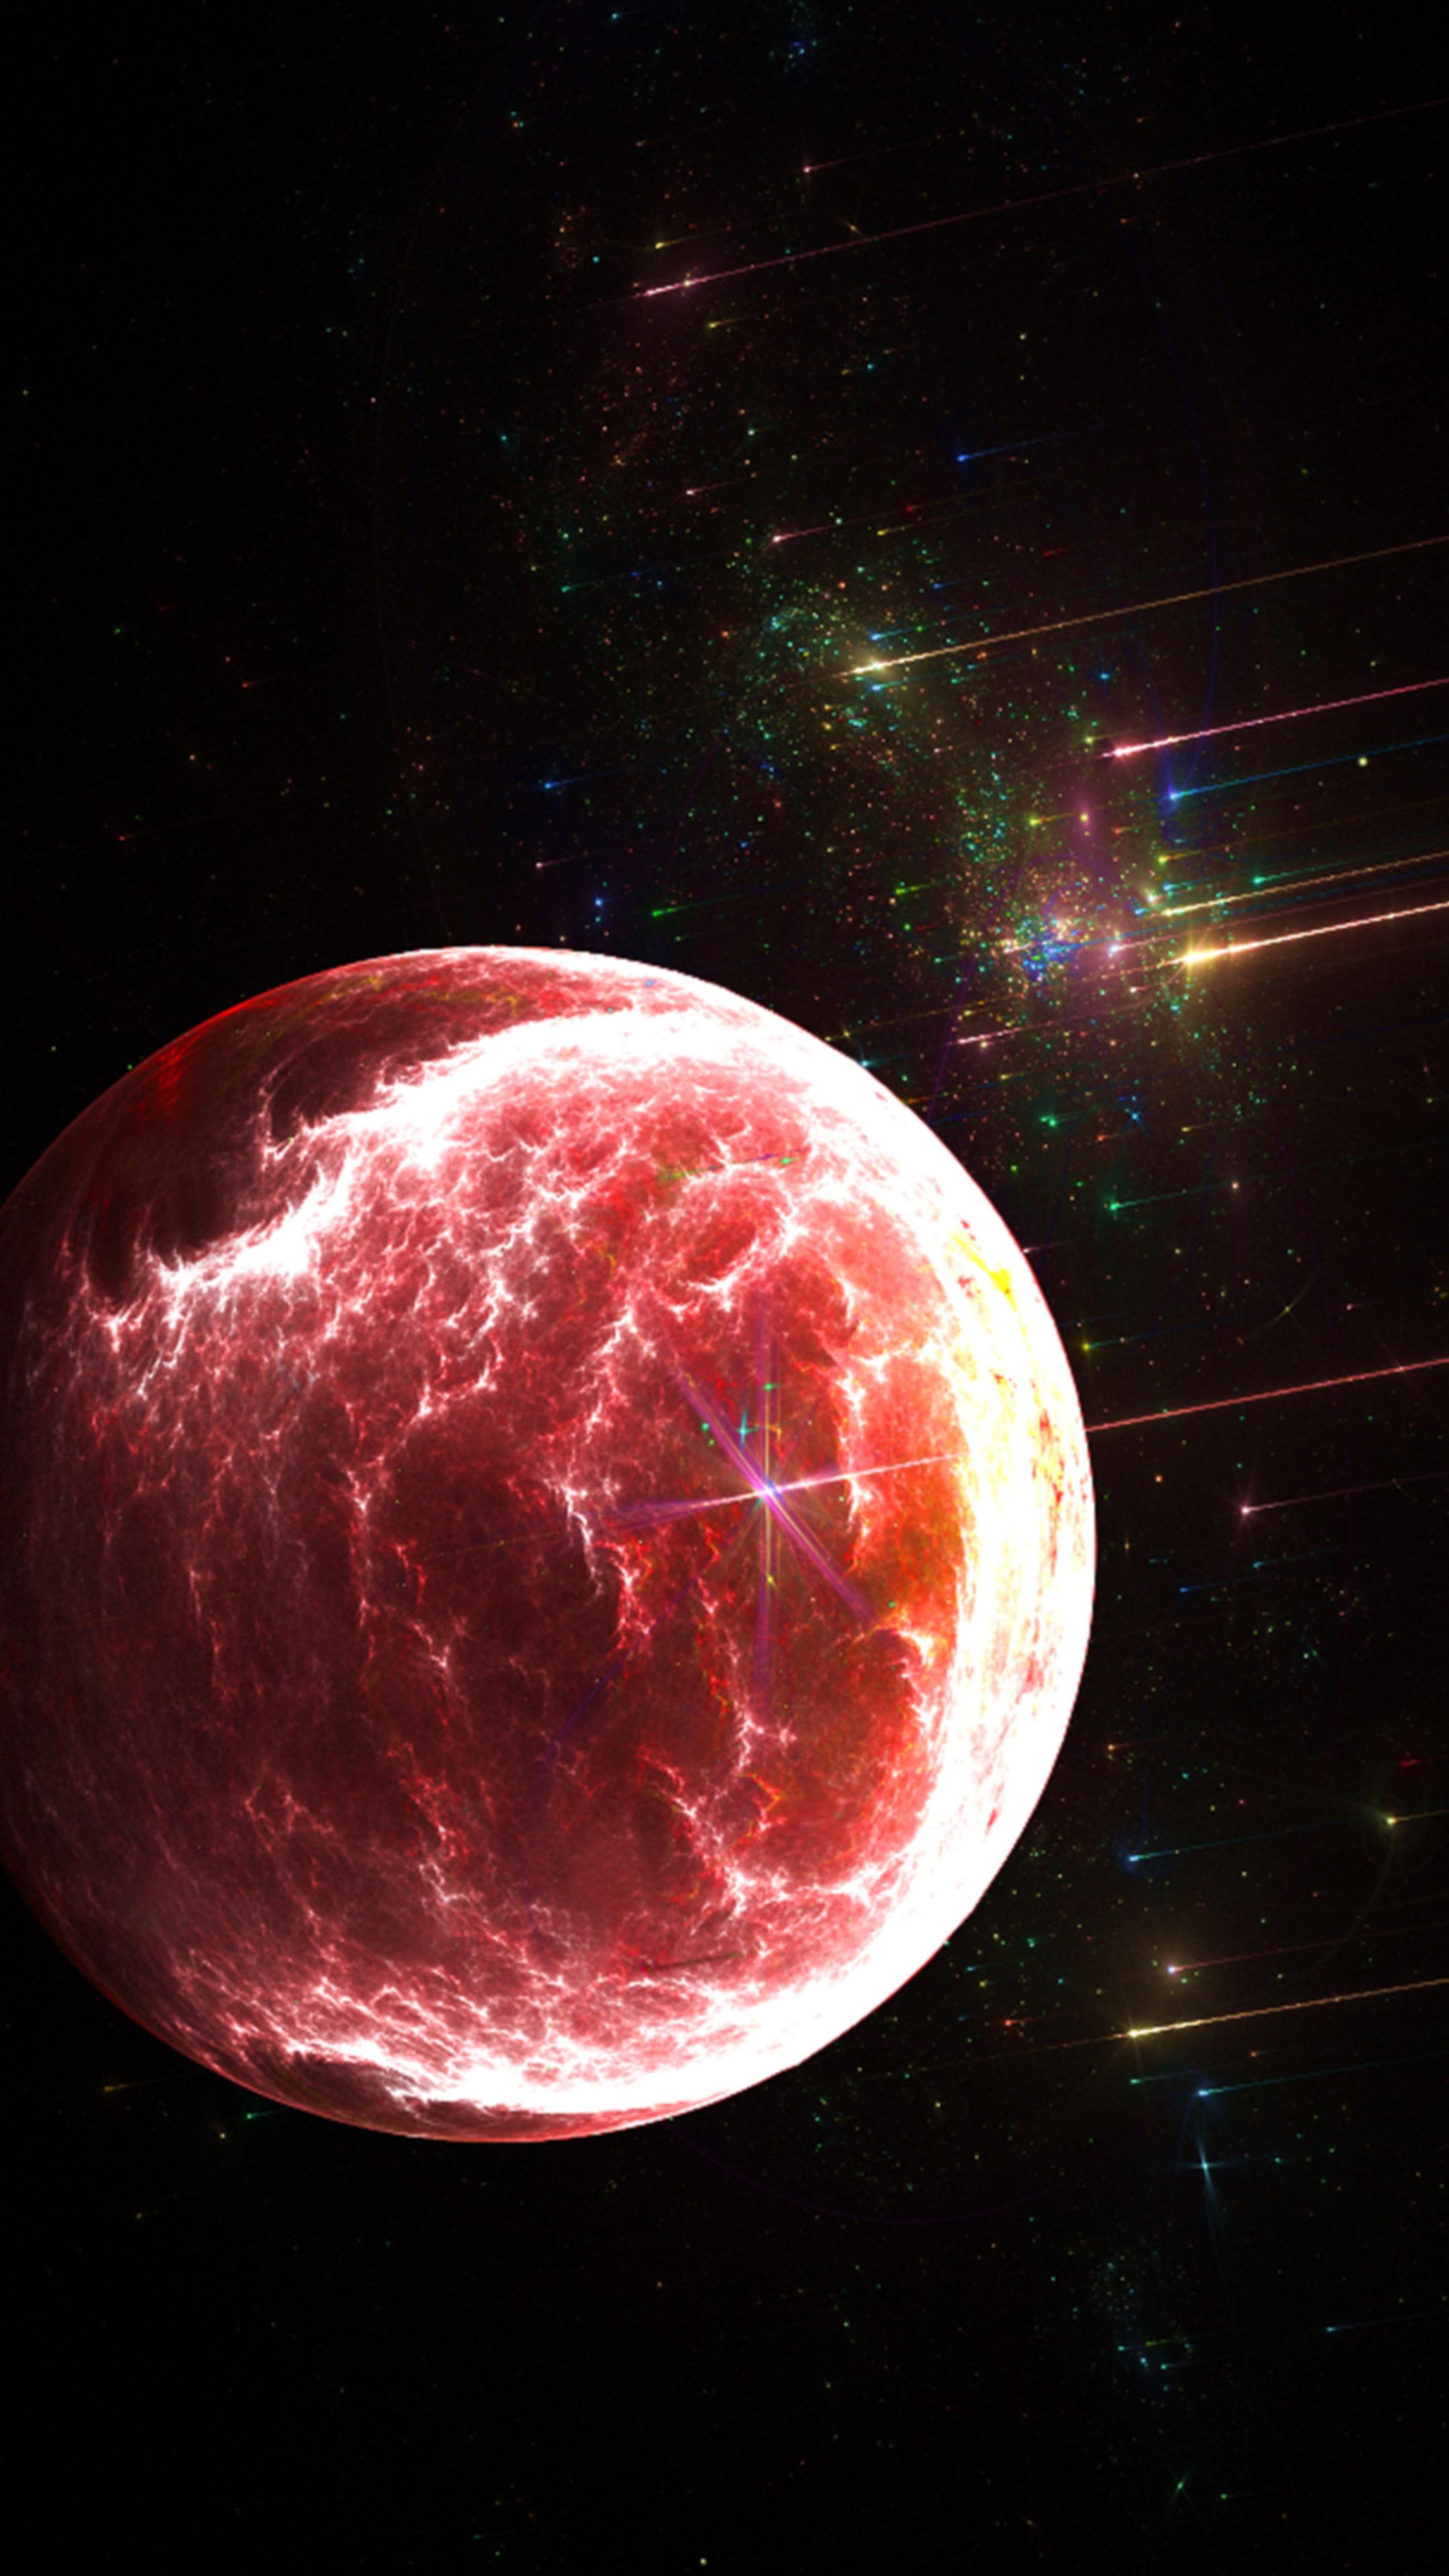 planet-red-fire-fractal-4k-l1.jpg